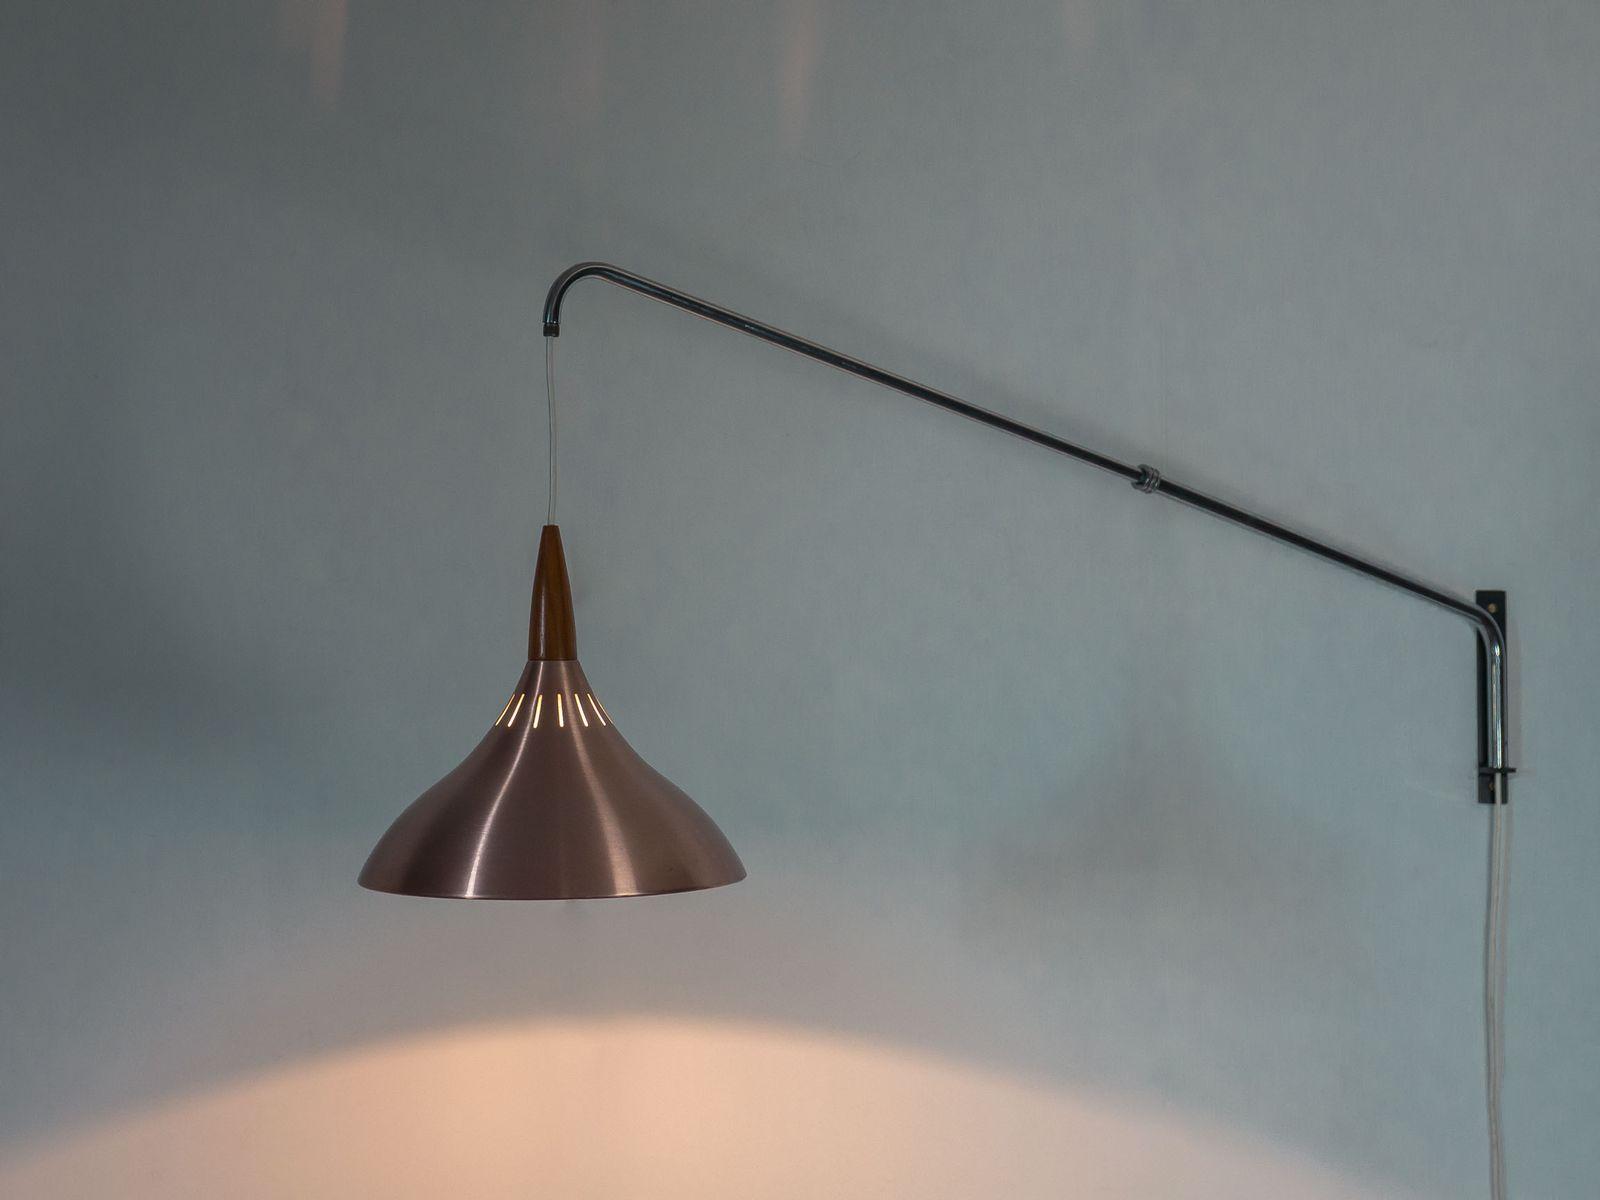 applique murale vintage ajustable de raak amsterdam en vente sur pamono. Black Bedroom Furniture Sets. Home Design Ideas